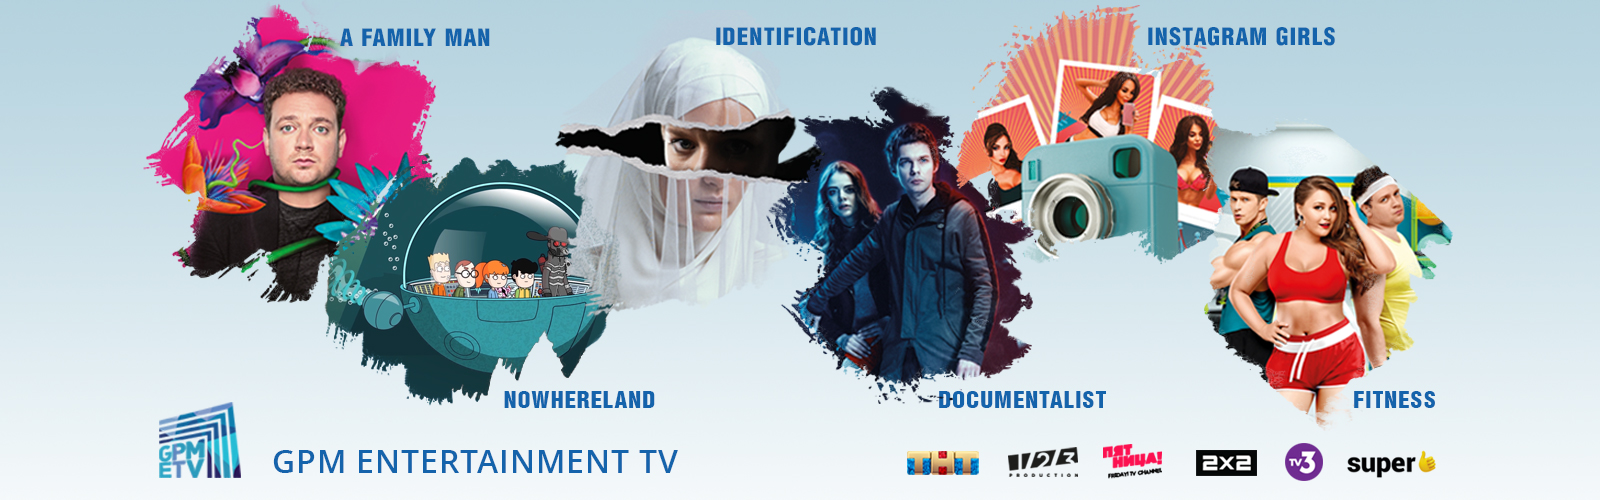 GPM Entertainment TV